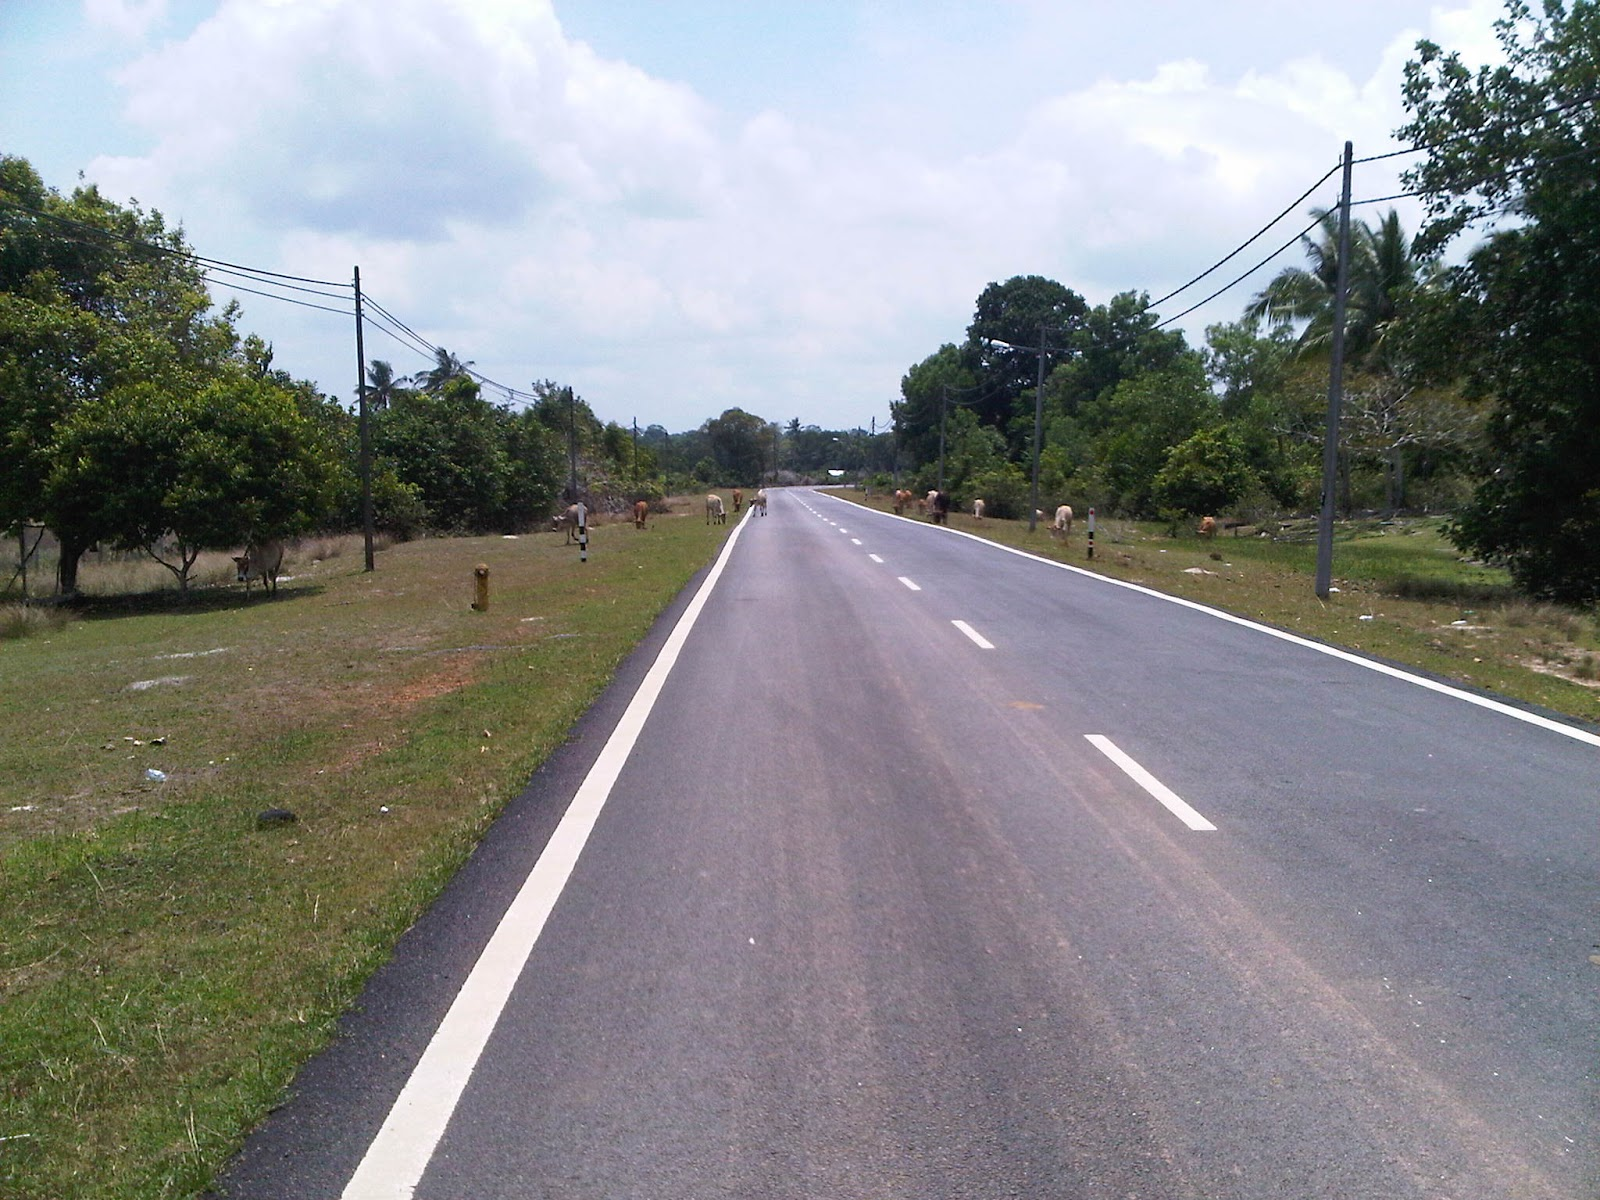 malaysia-b-road-cows-exotic-palm-plantation